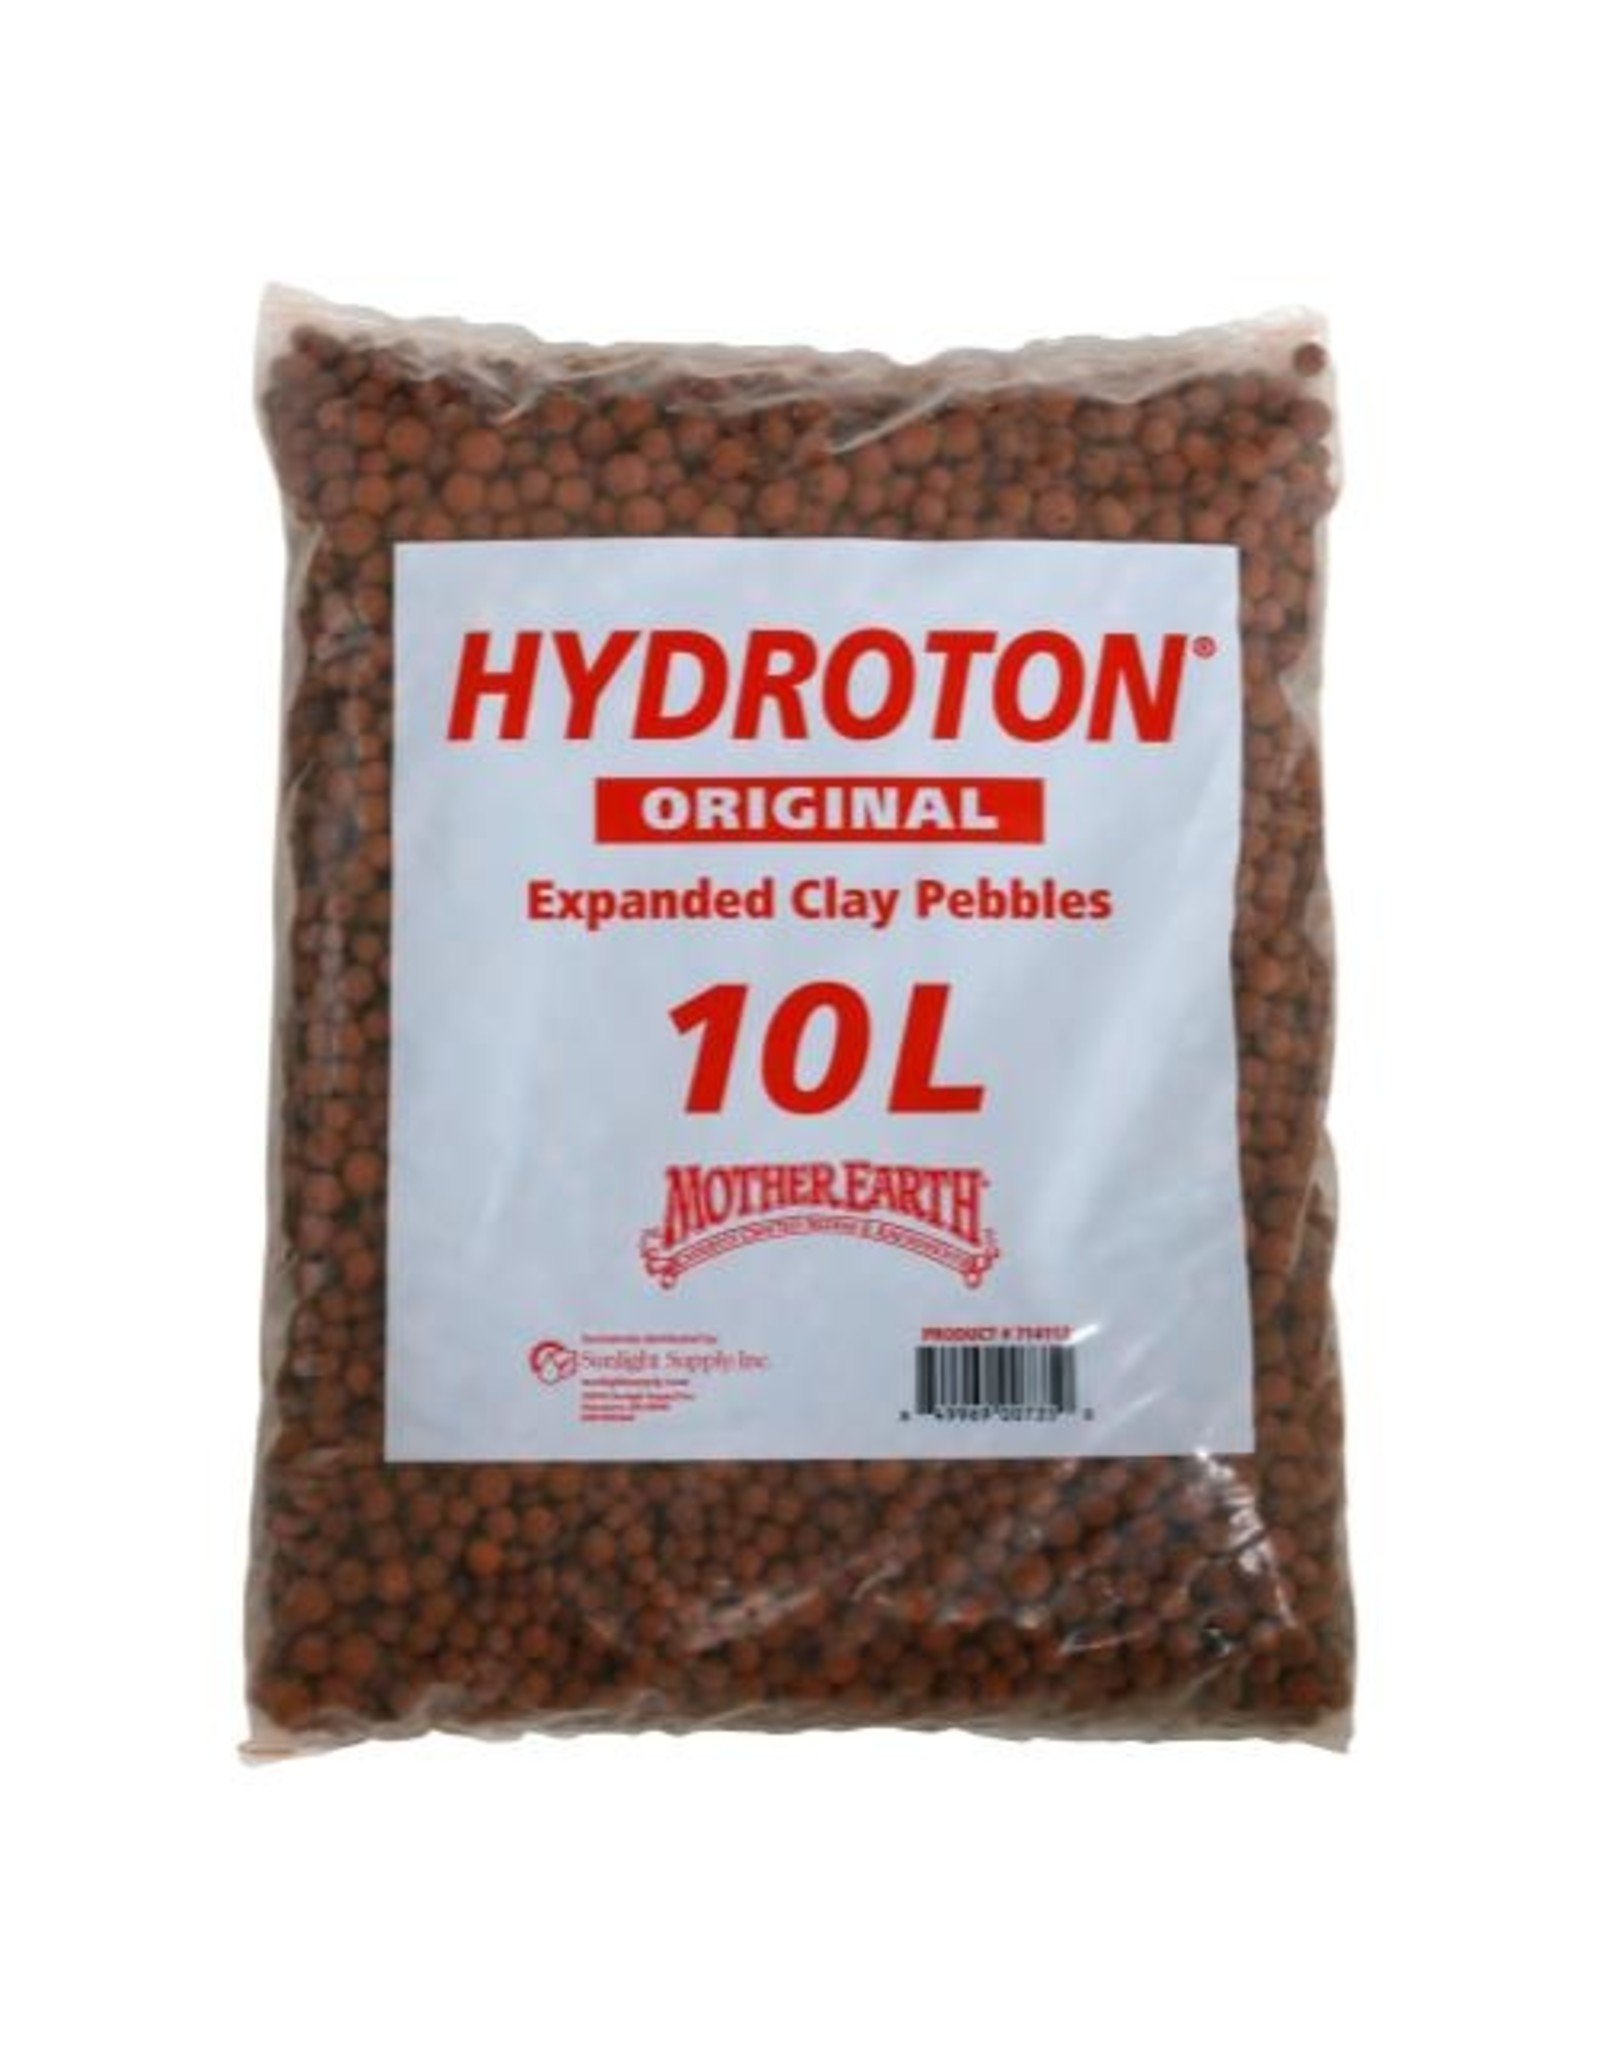 Hydroton Original - 10L Bag